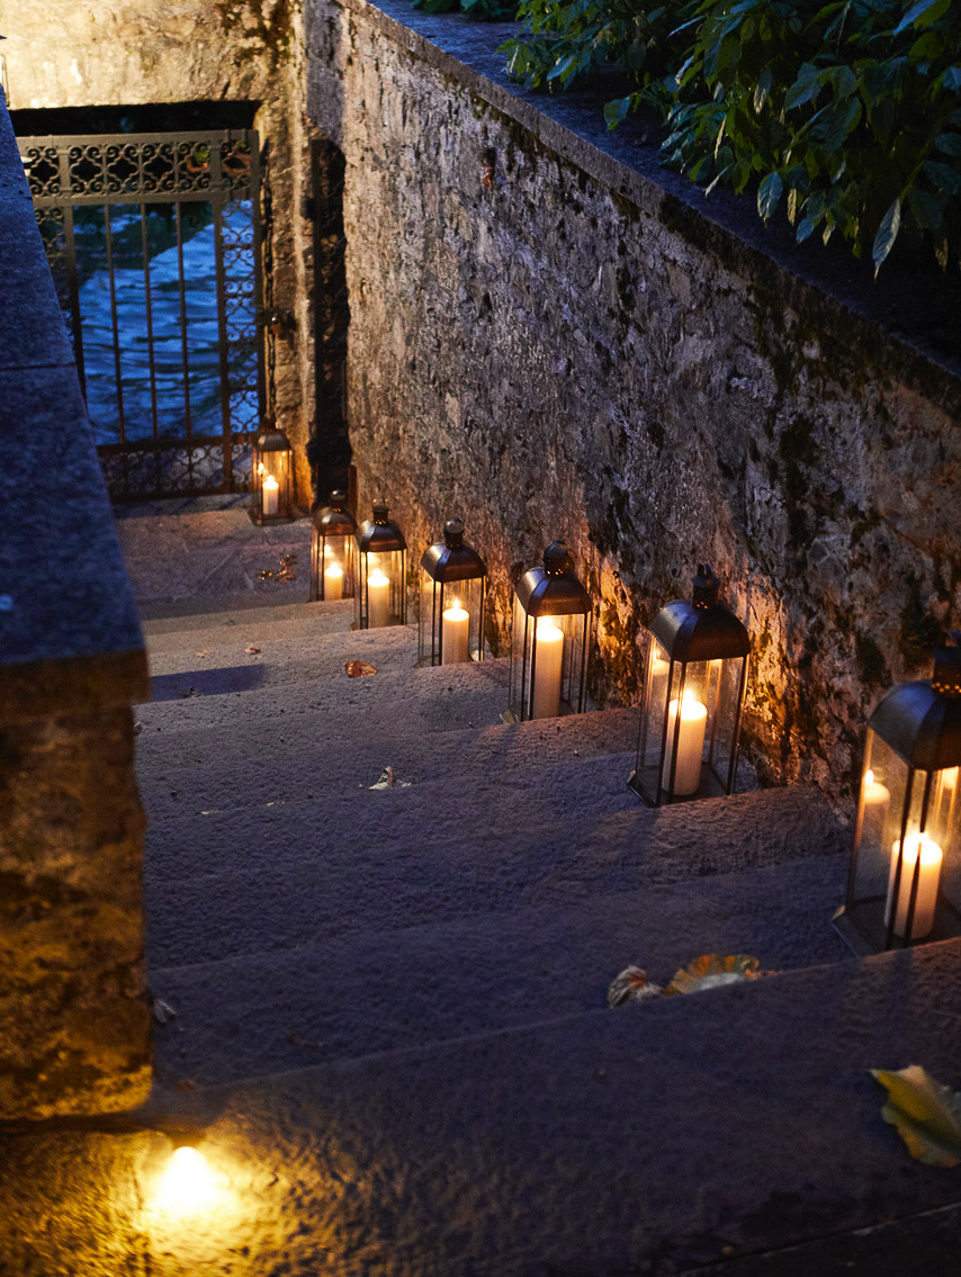 Villa balbiano by night